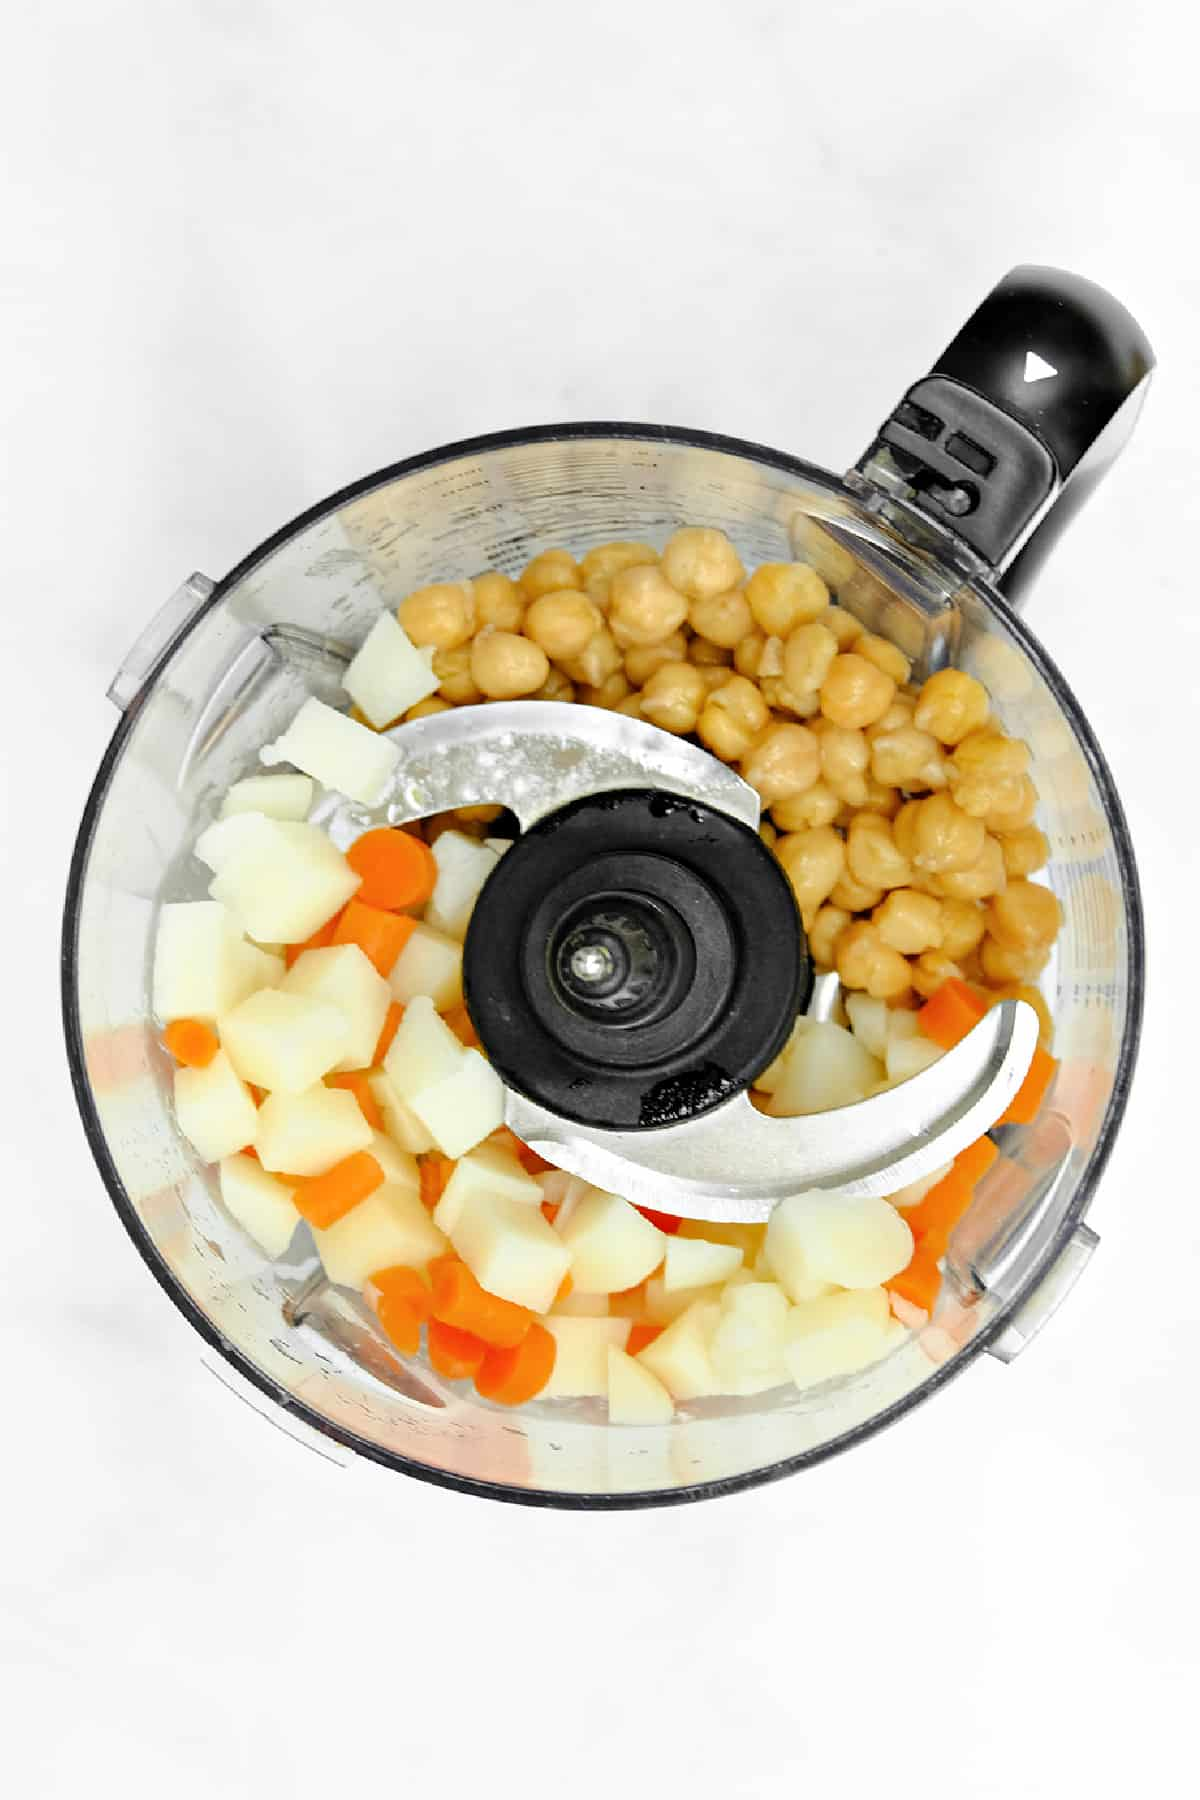 vegetables in food processor